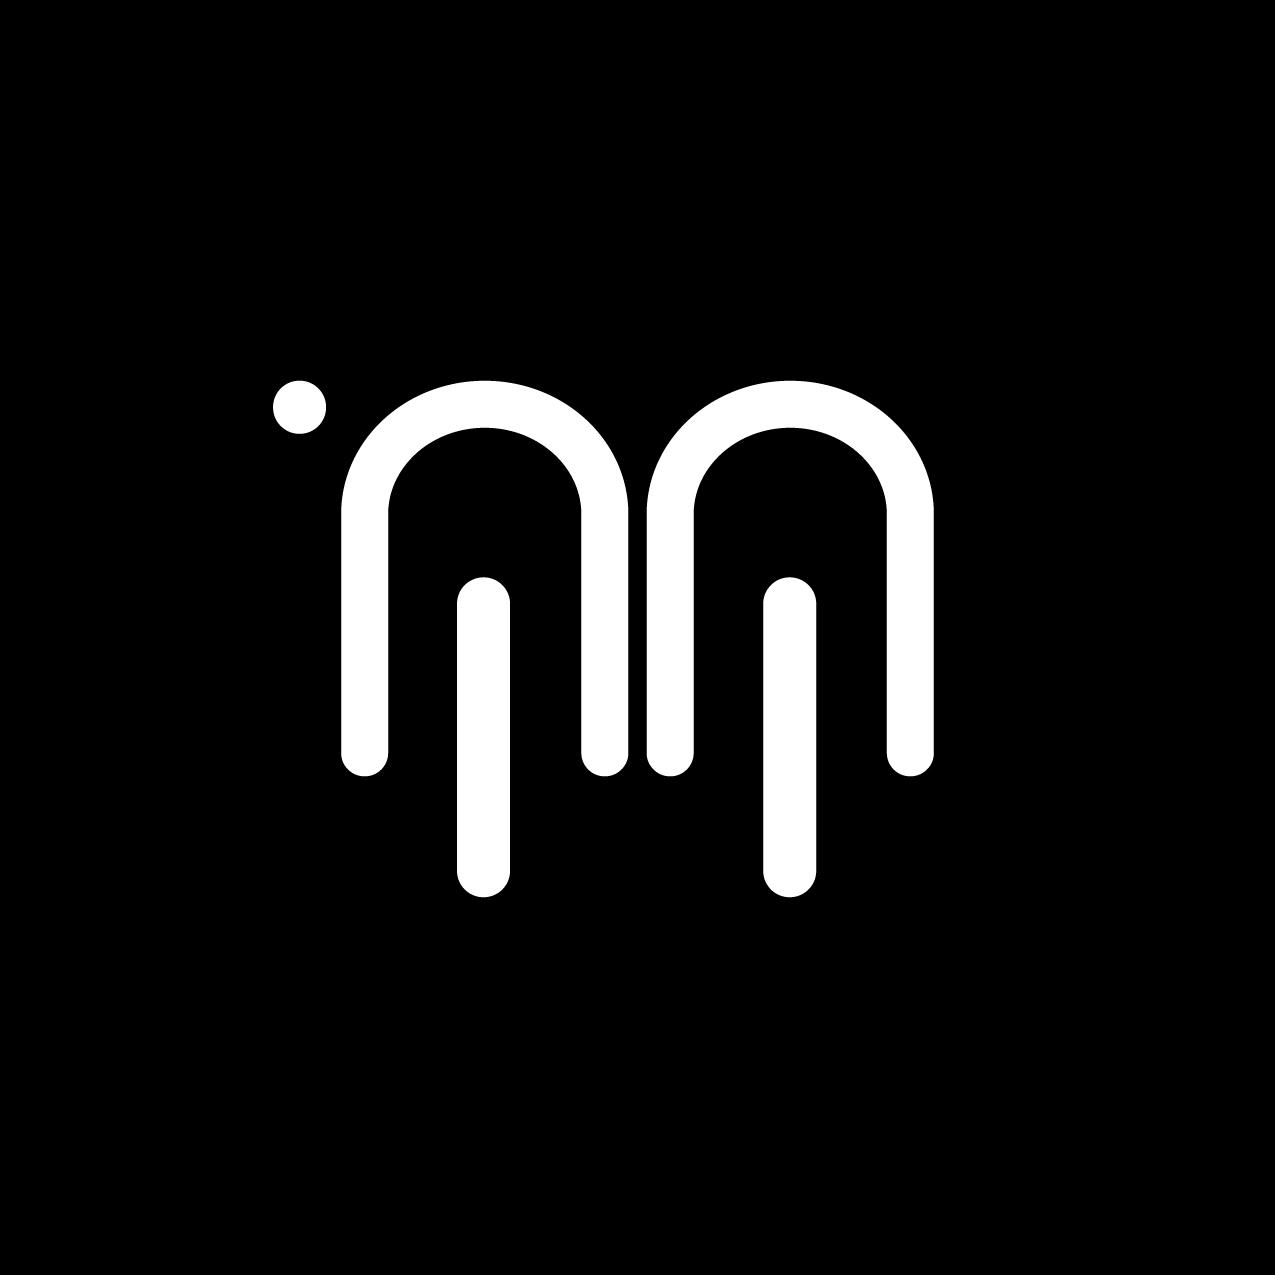 Letter M13 Design by Furia